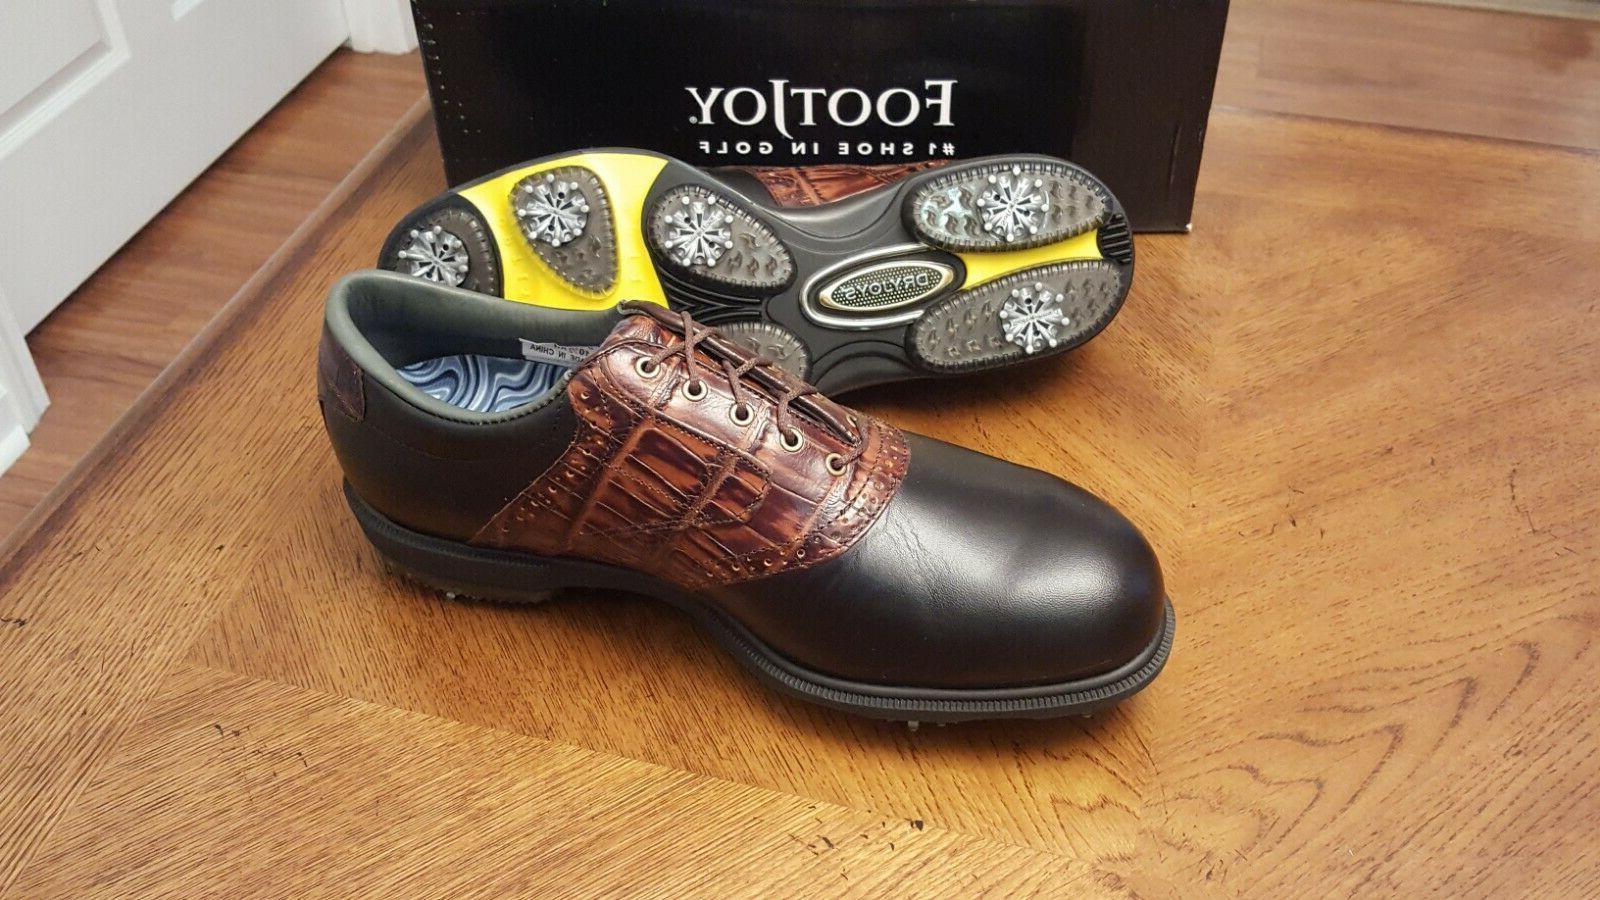 2014 Golf Shoes 53729 Blk/Brn Beautiful